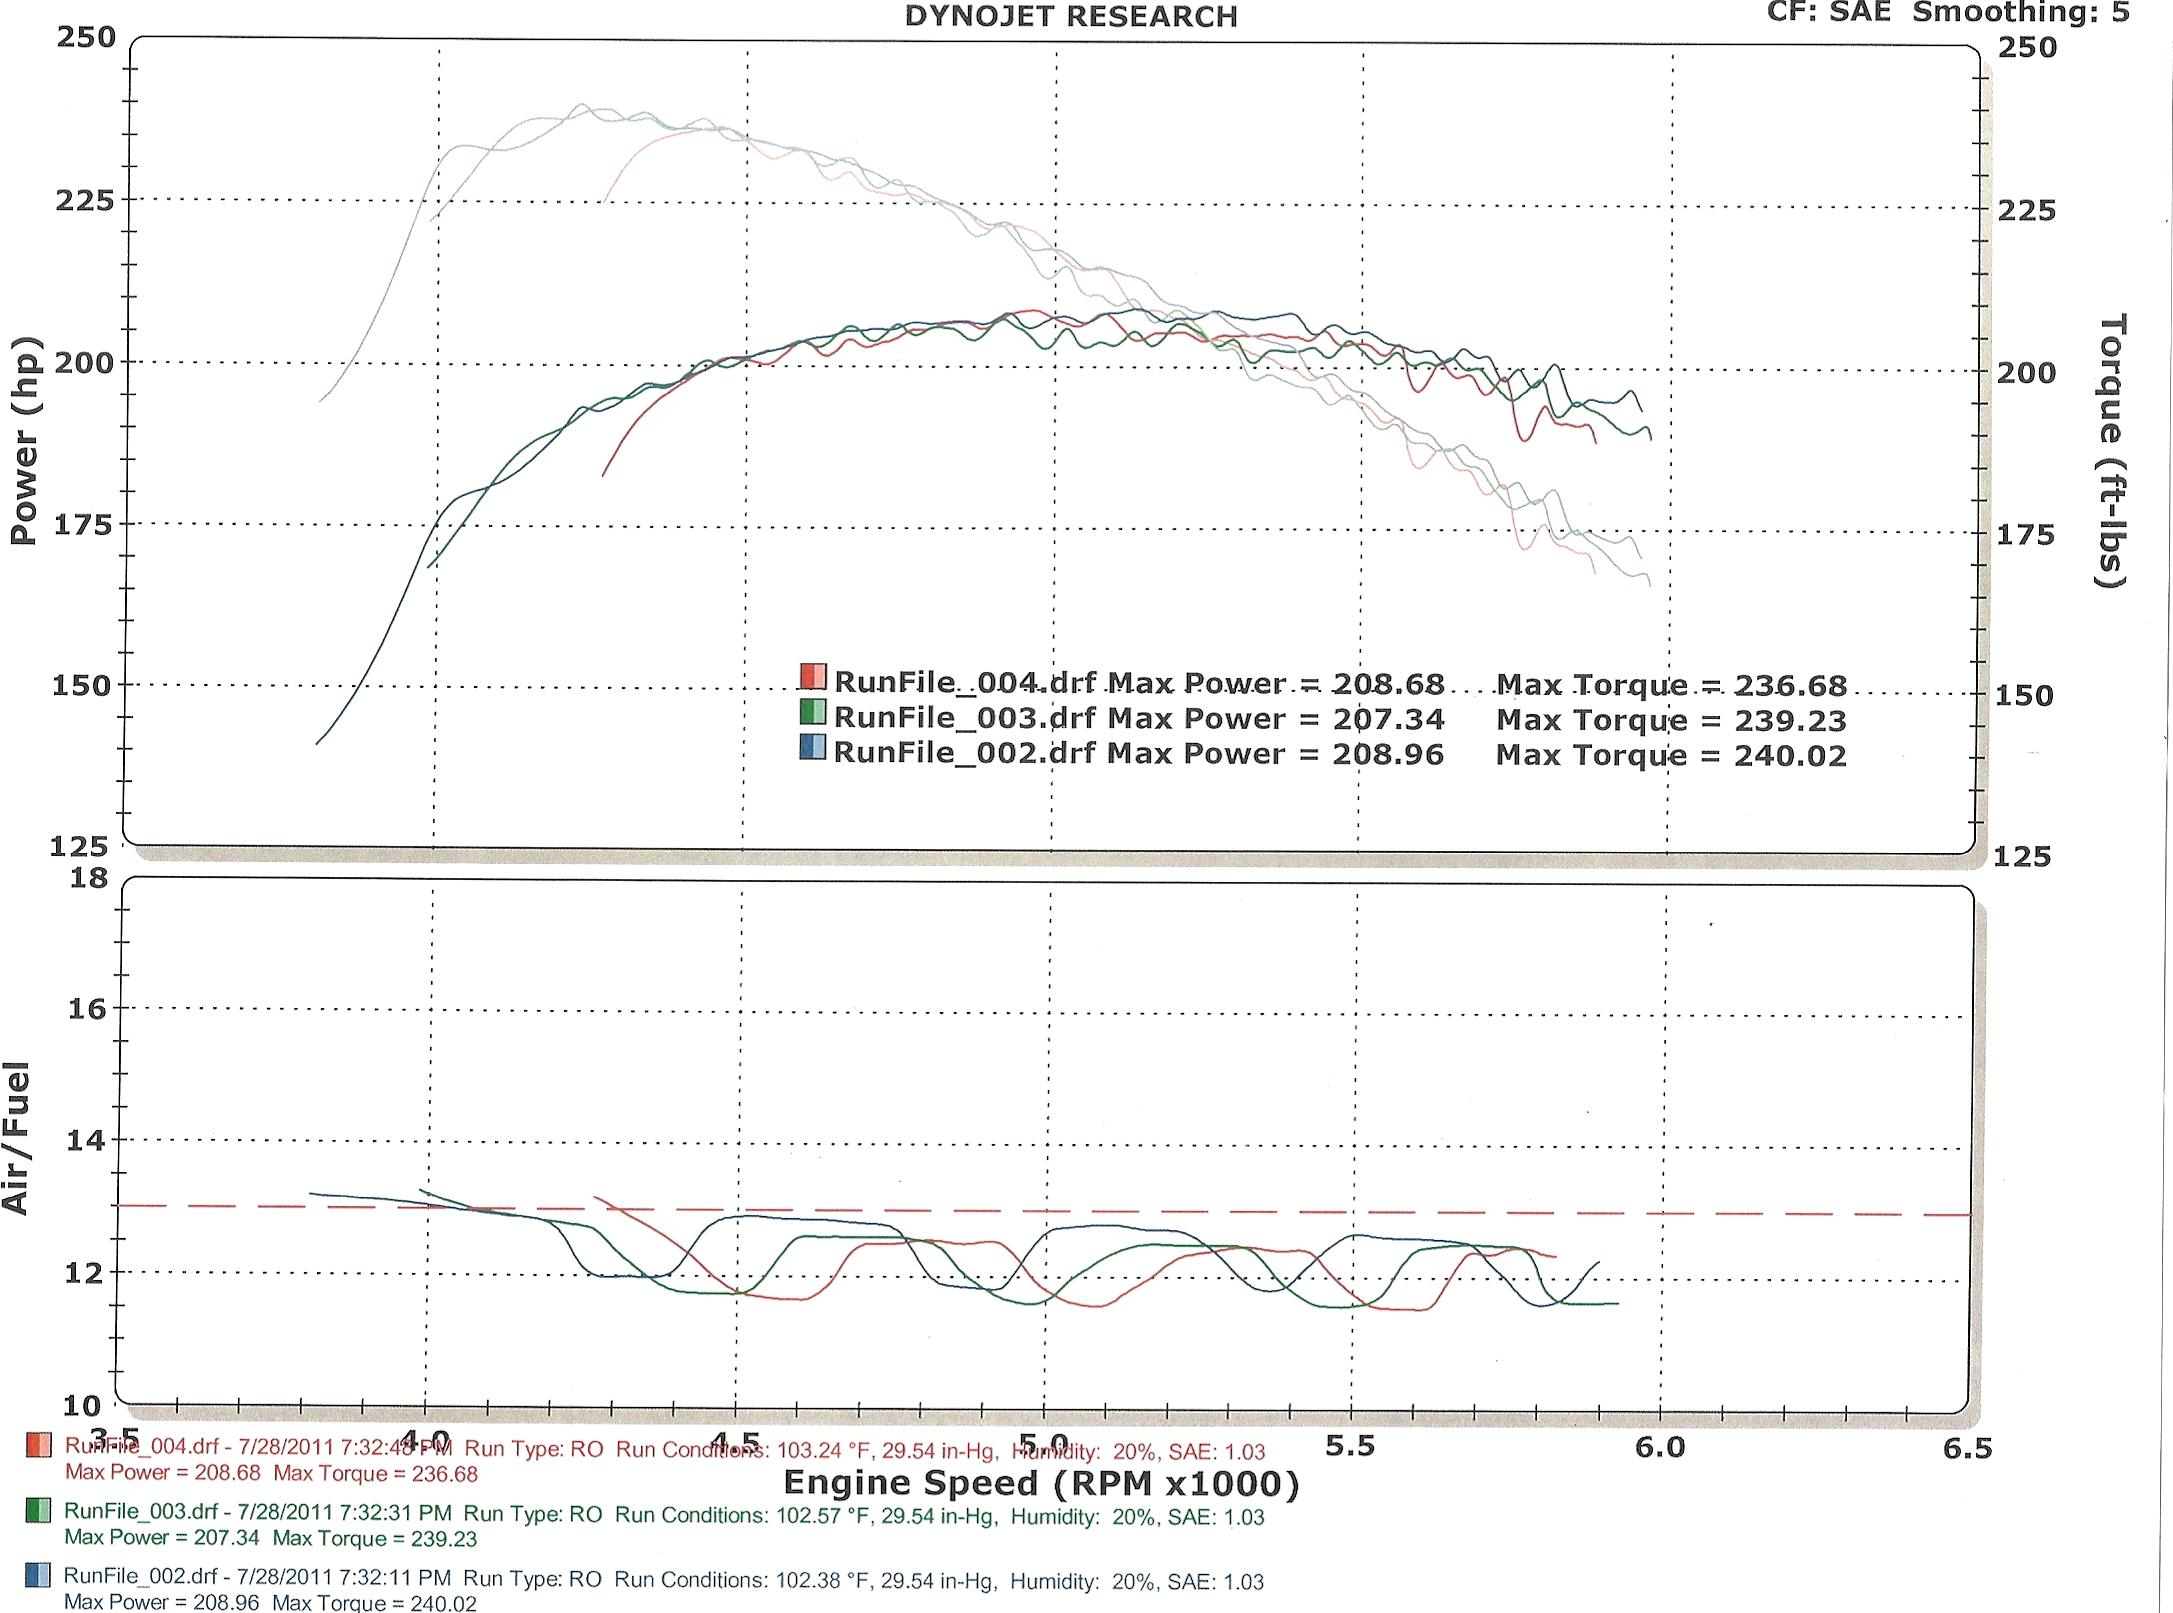 Pontiac Fiero Dyno Graph Results